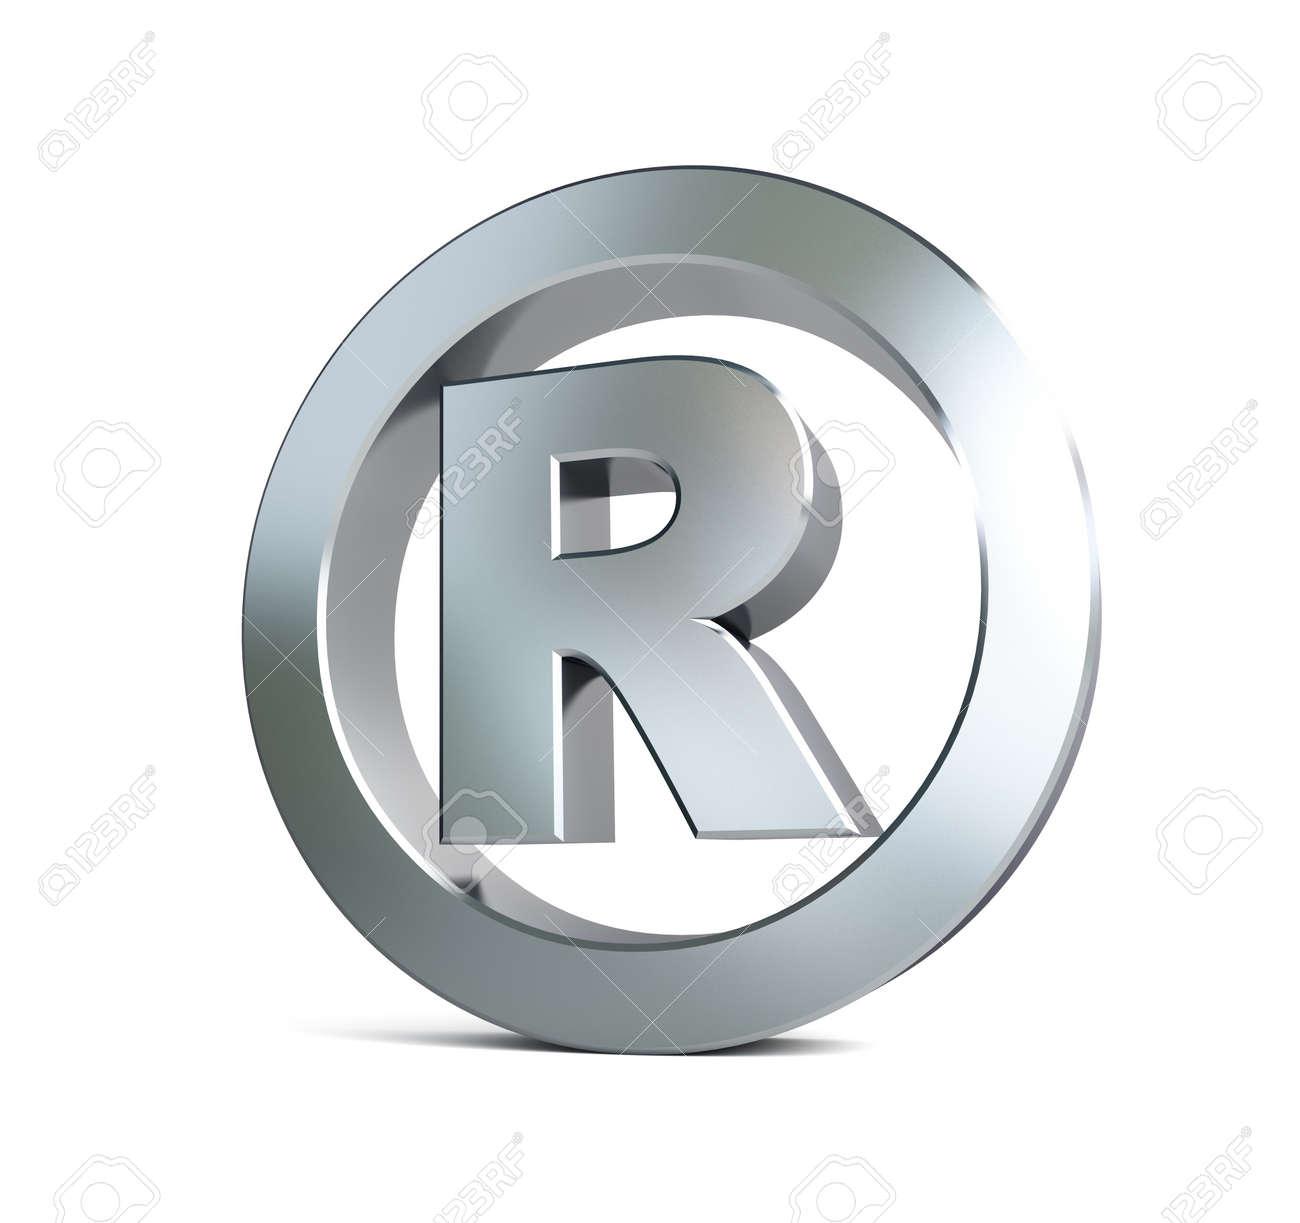 registered trademark sign 3d Illustrations on a white background Stock Illustration - 18199331